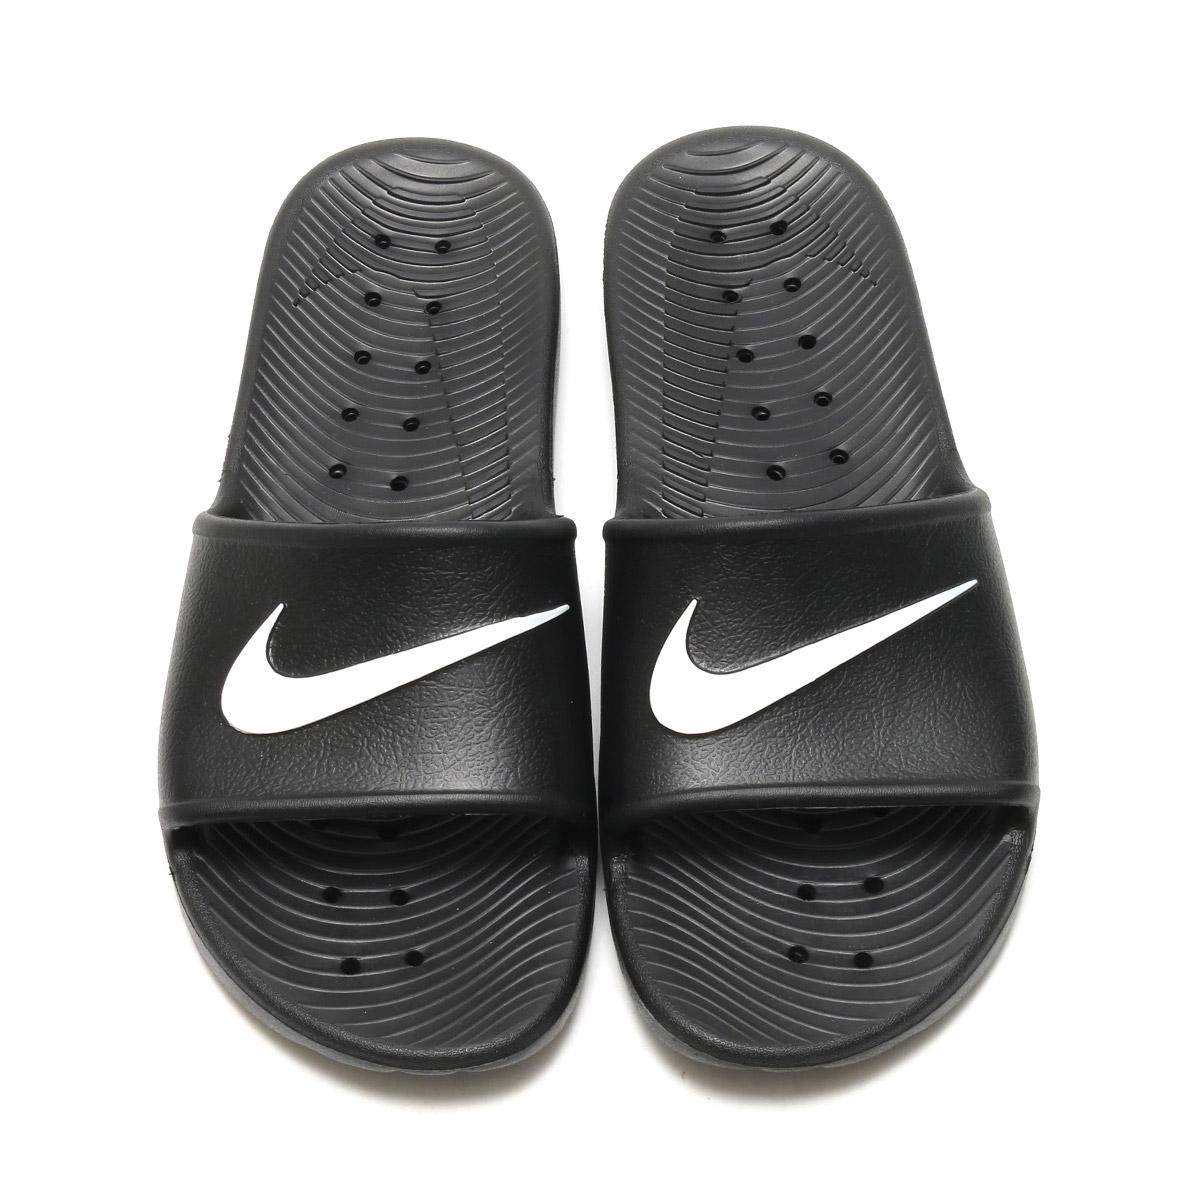 0ec5d5a01f5 Nike Kawa Shower Mens Slides Black Navy